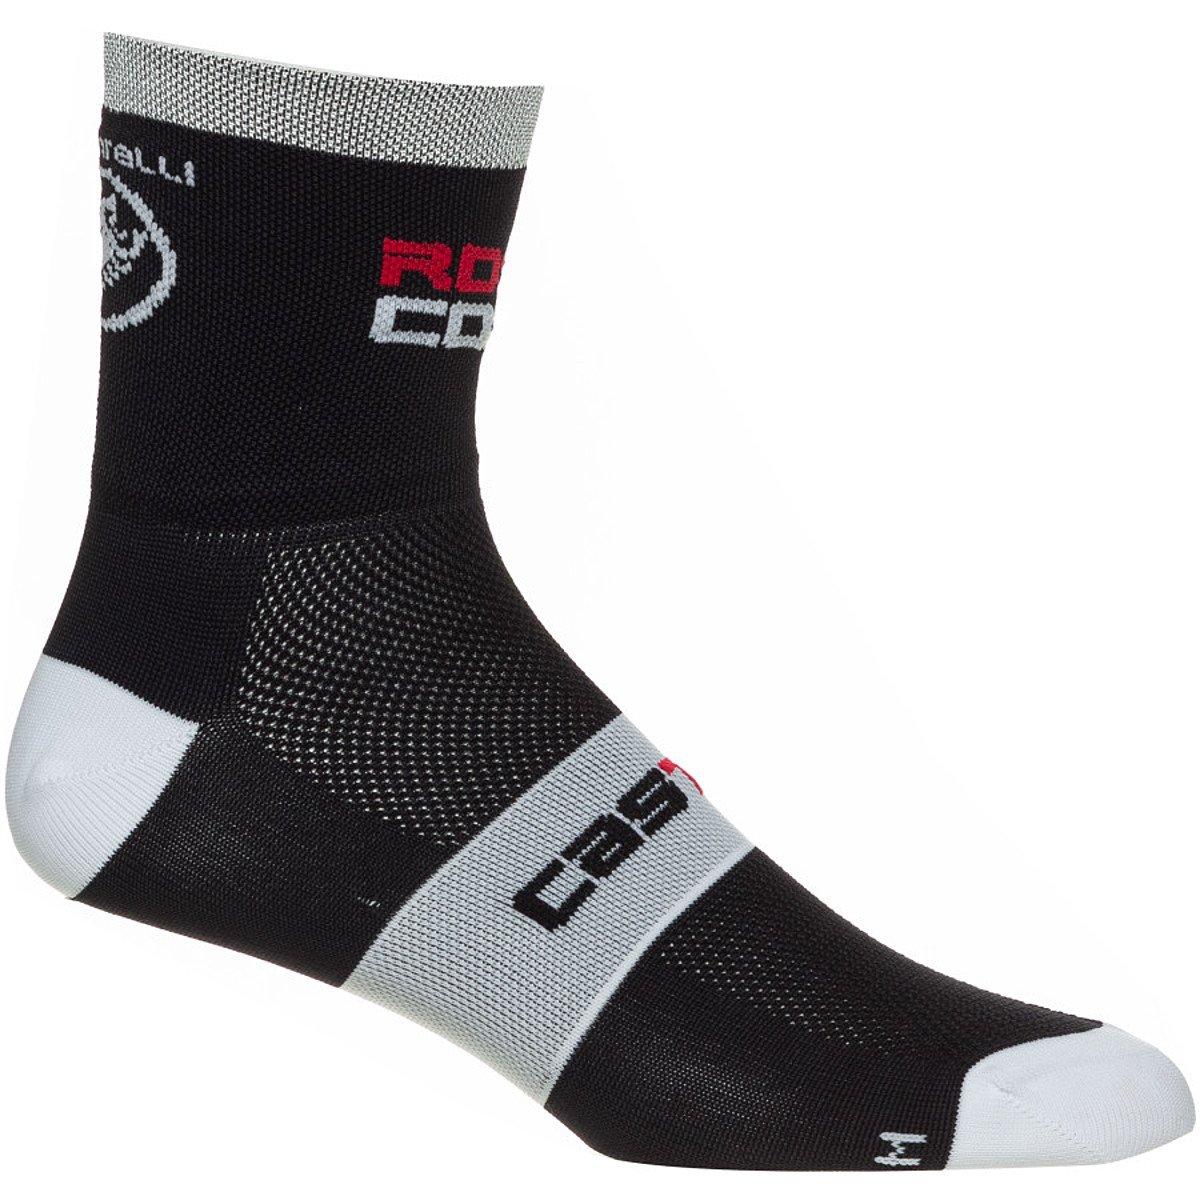 купить  Castelli Rosso Corsa 9 Socks - Men's  недорого